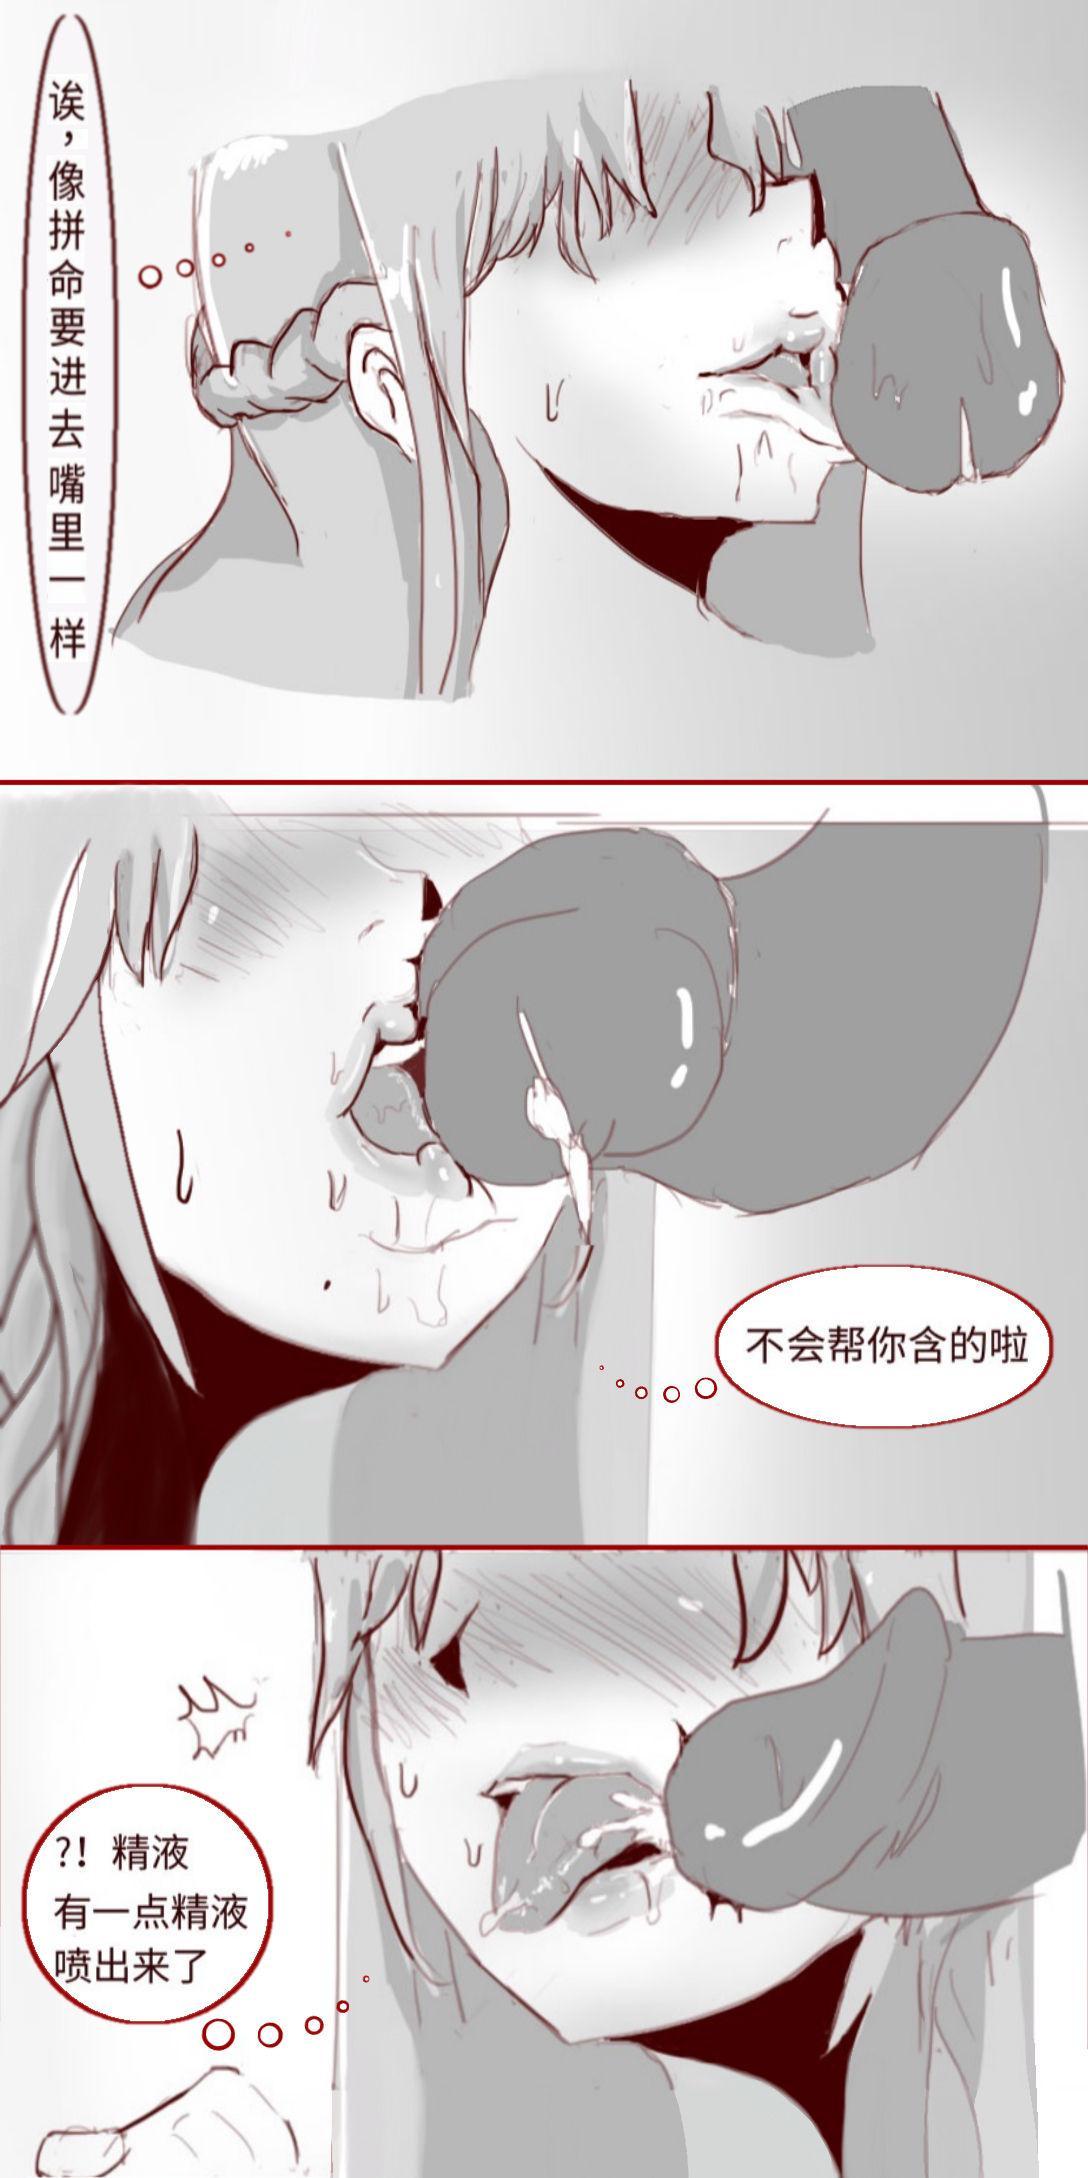 SAO里发生的一个sex bug 11